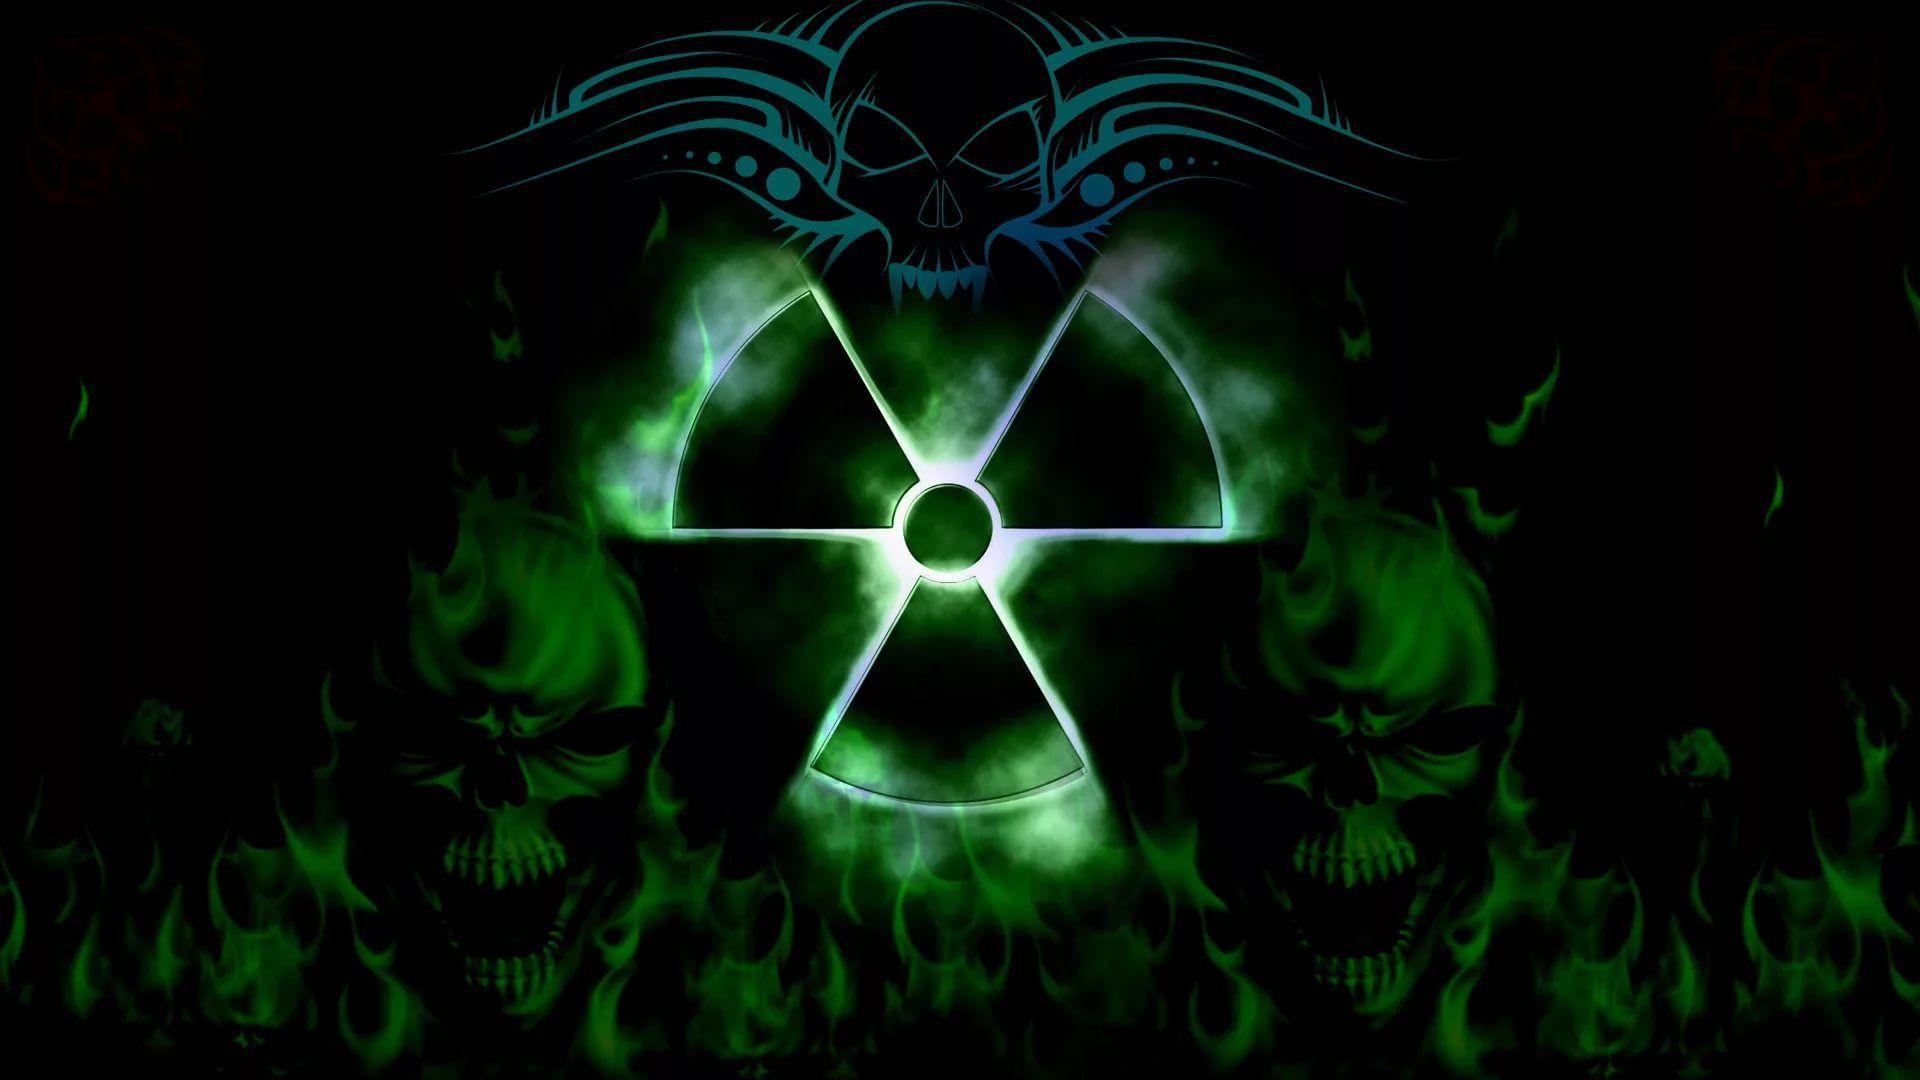 Neon Green free download wallpaper